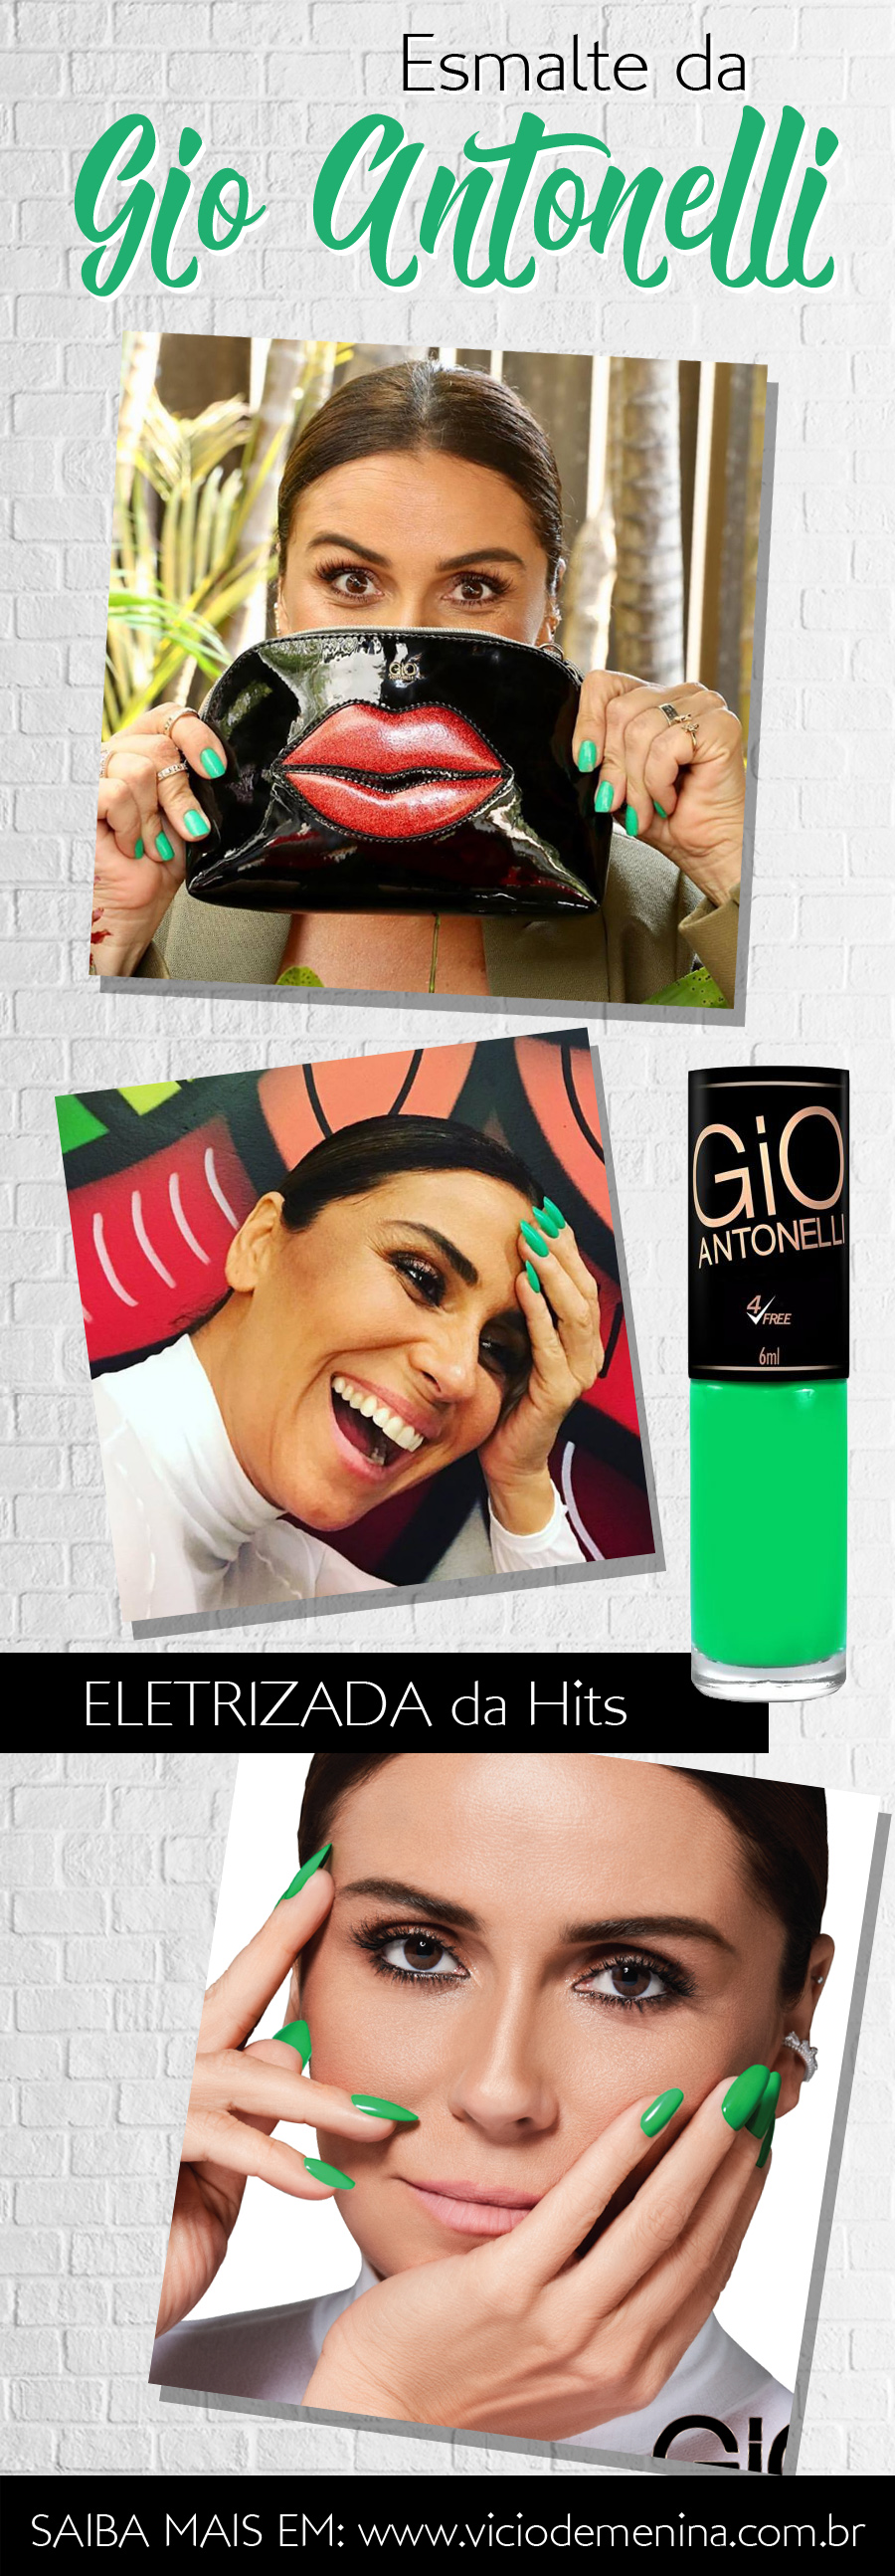 eletrizada_verde_giovanna_antonelli